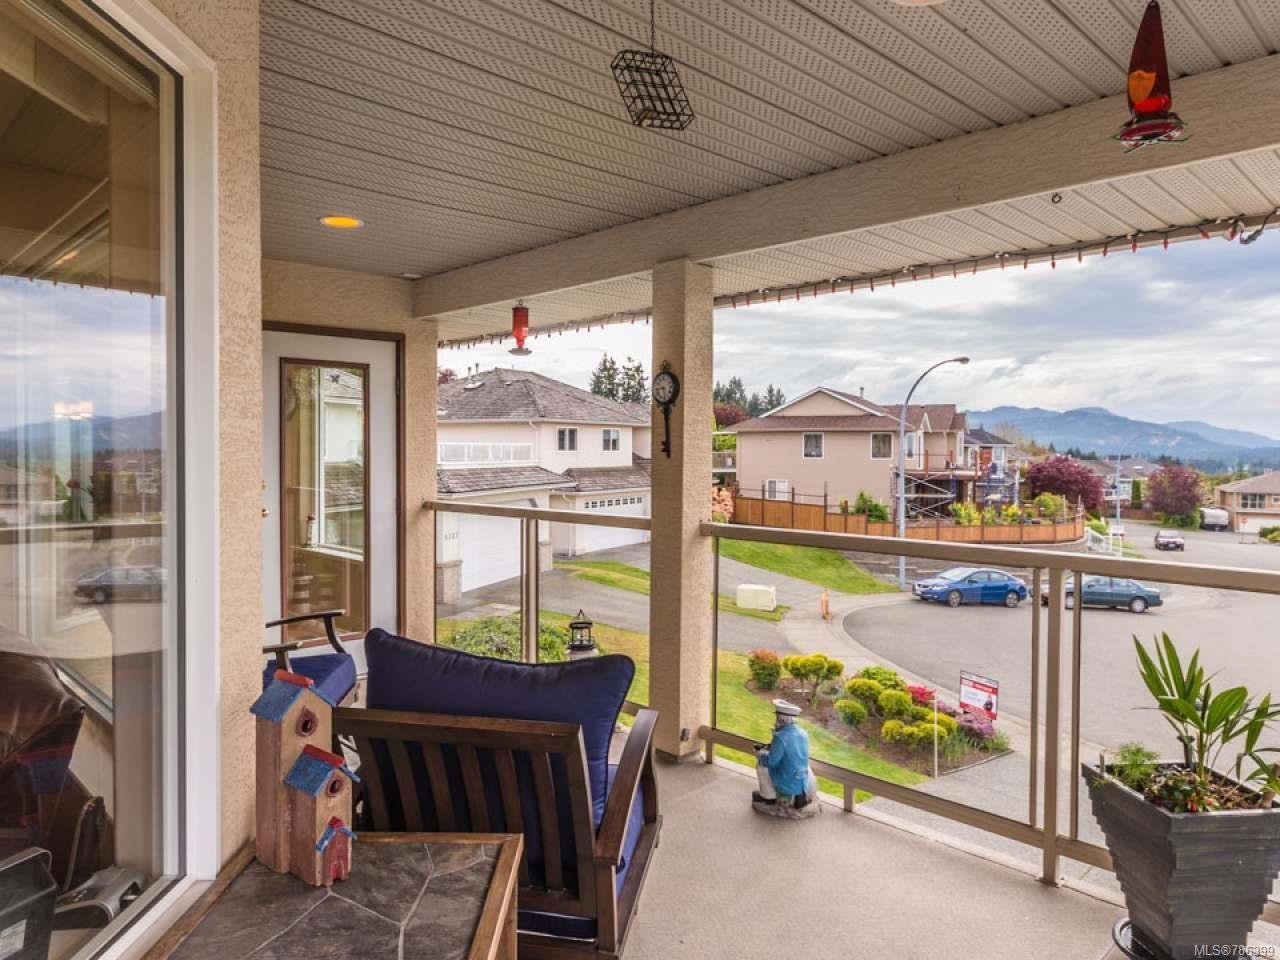 Photo 12: Photos: 5371 HIGHRIDGE PLACE in NANAIMO: Na North Nanaimo House for sale (Nanaimo)  : MLS®# 786399